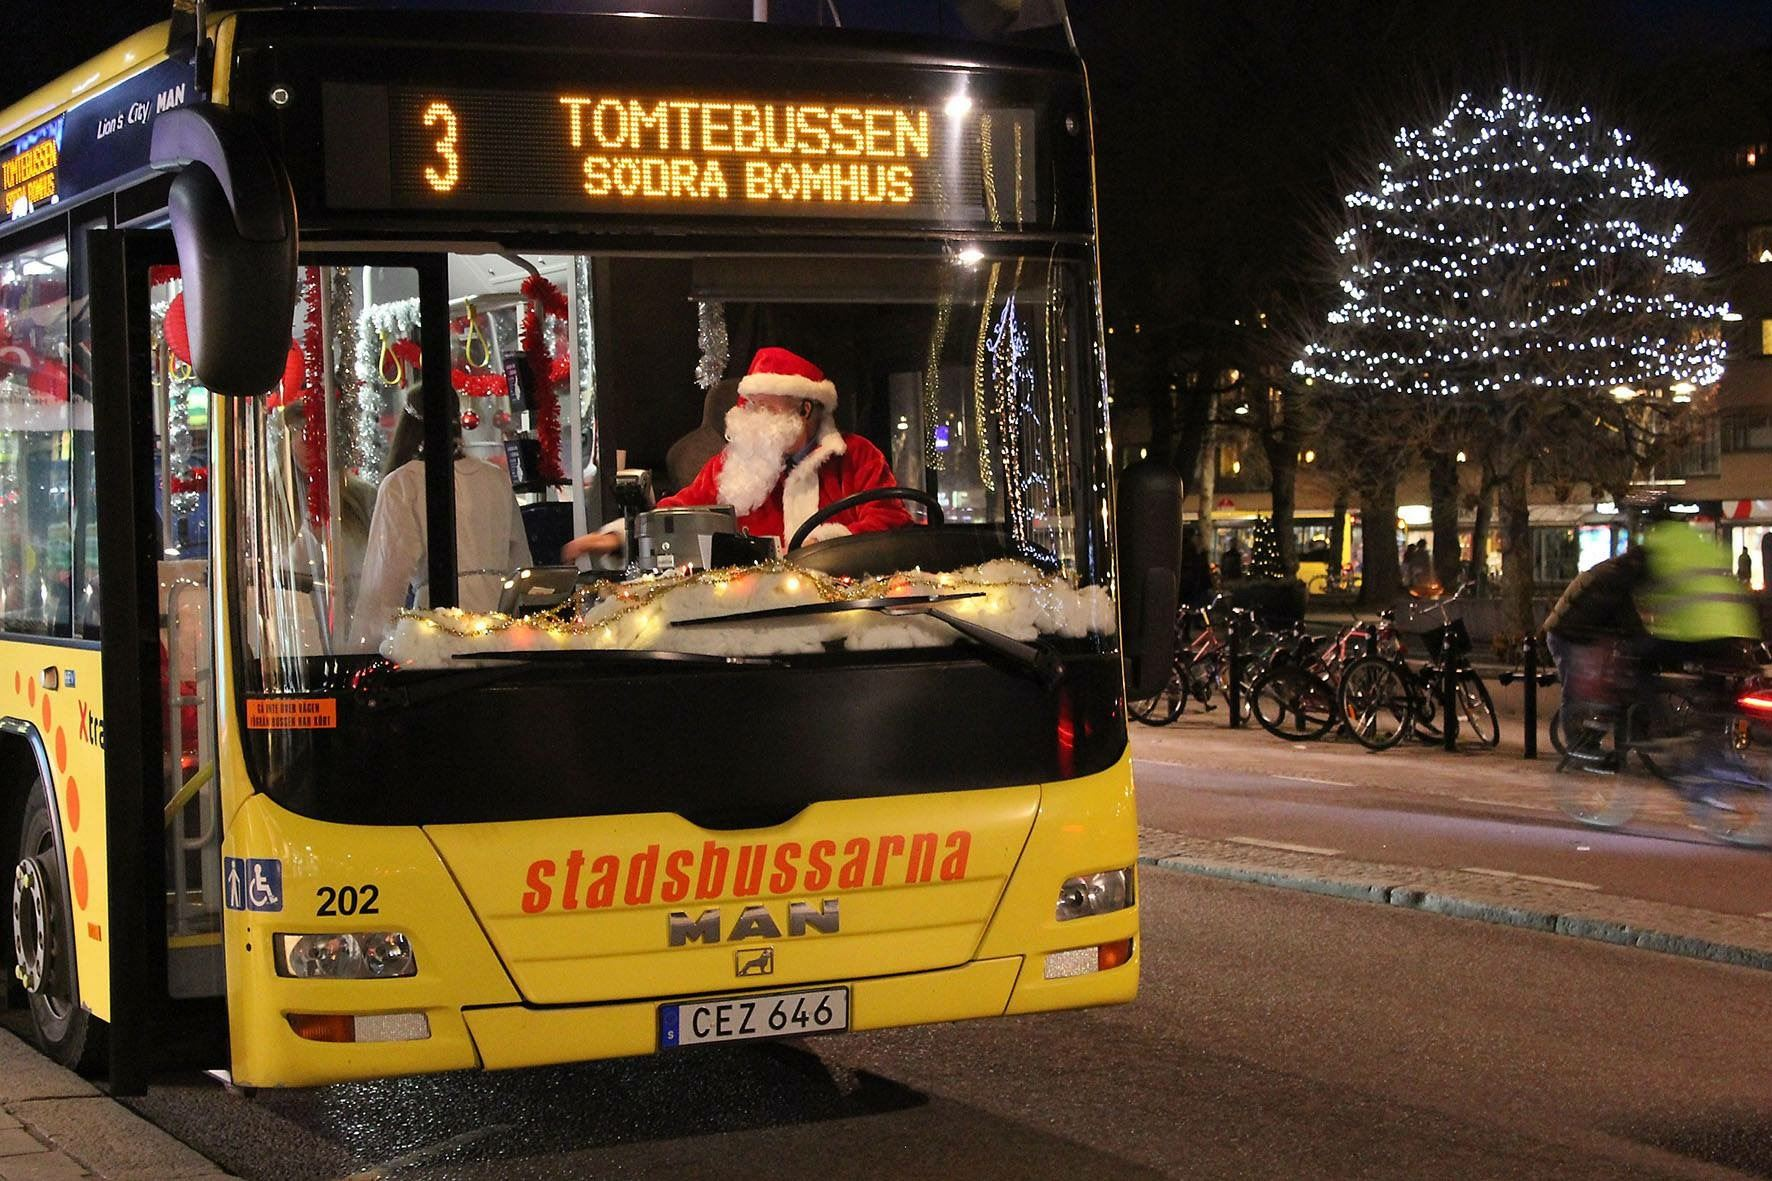 Tomtebussen